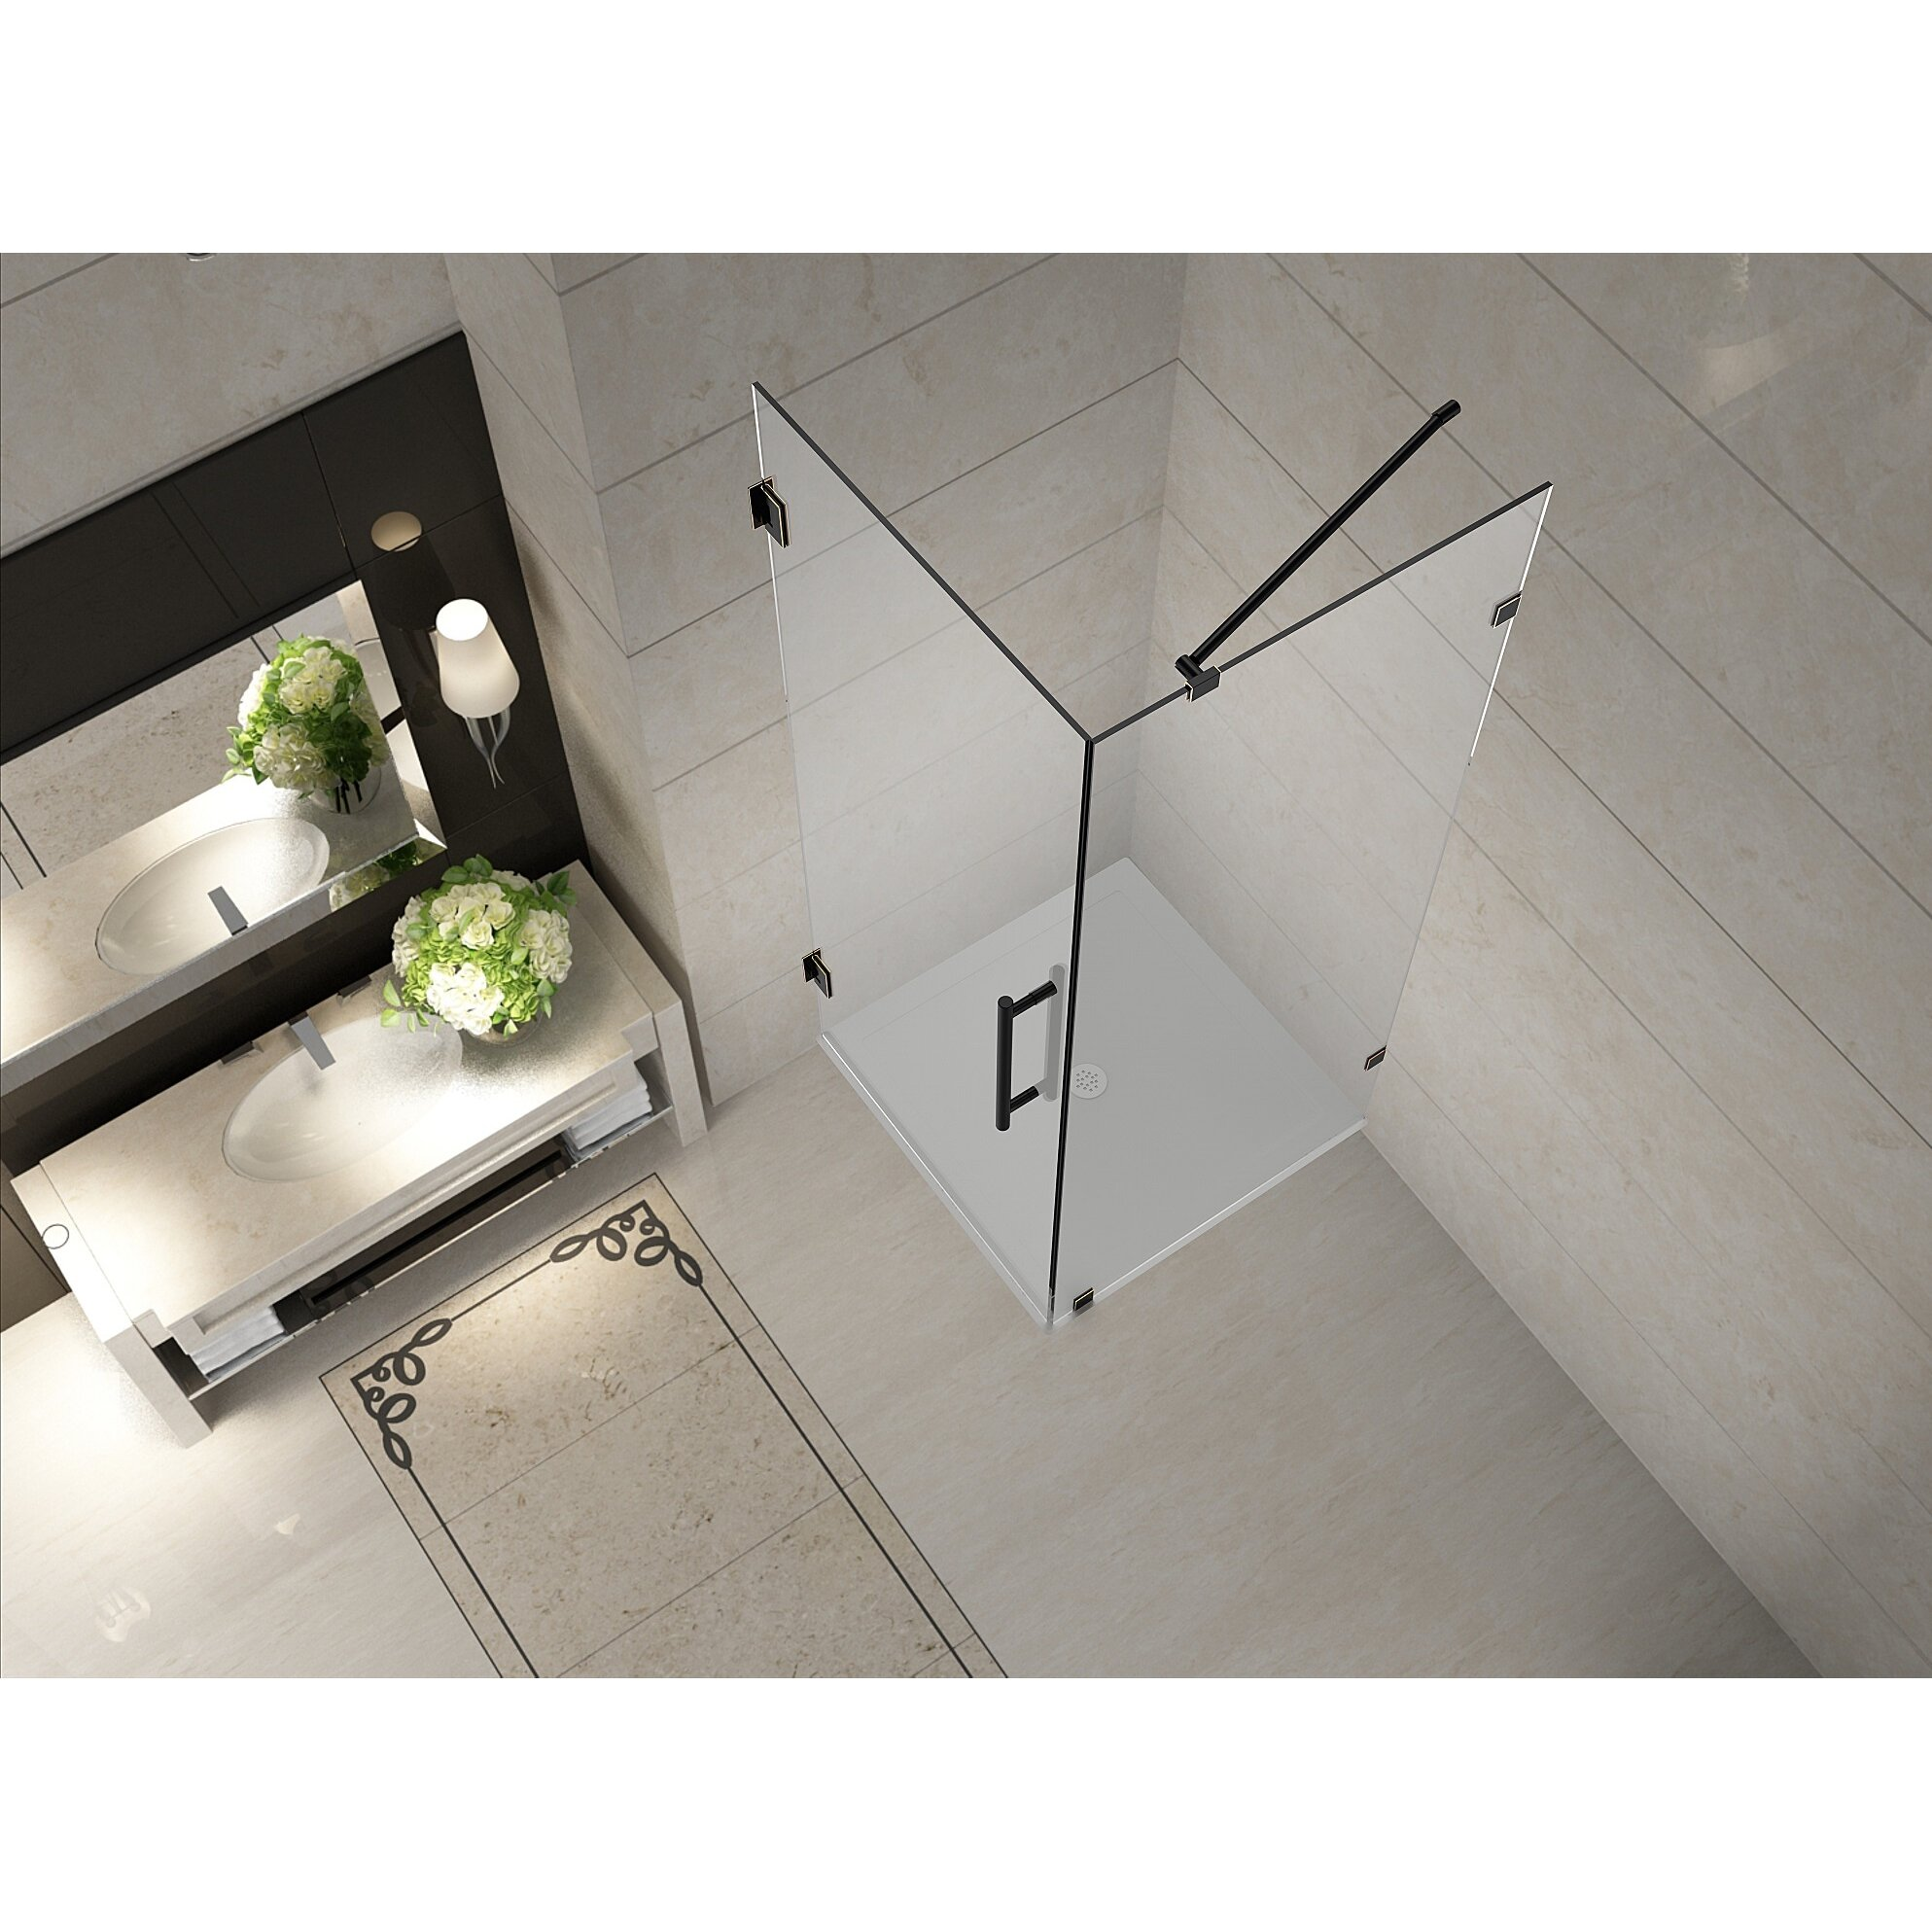 Aston Aquadica  X  X  Completely Frameless Square Hinged - 36 x 36 corner shower stall